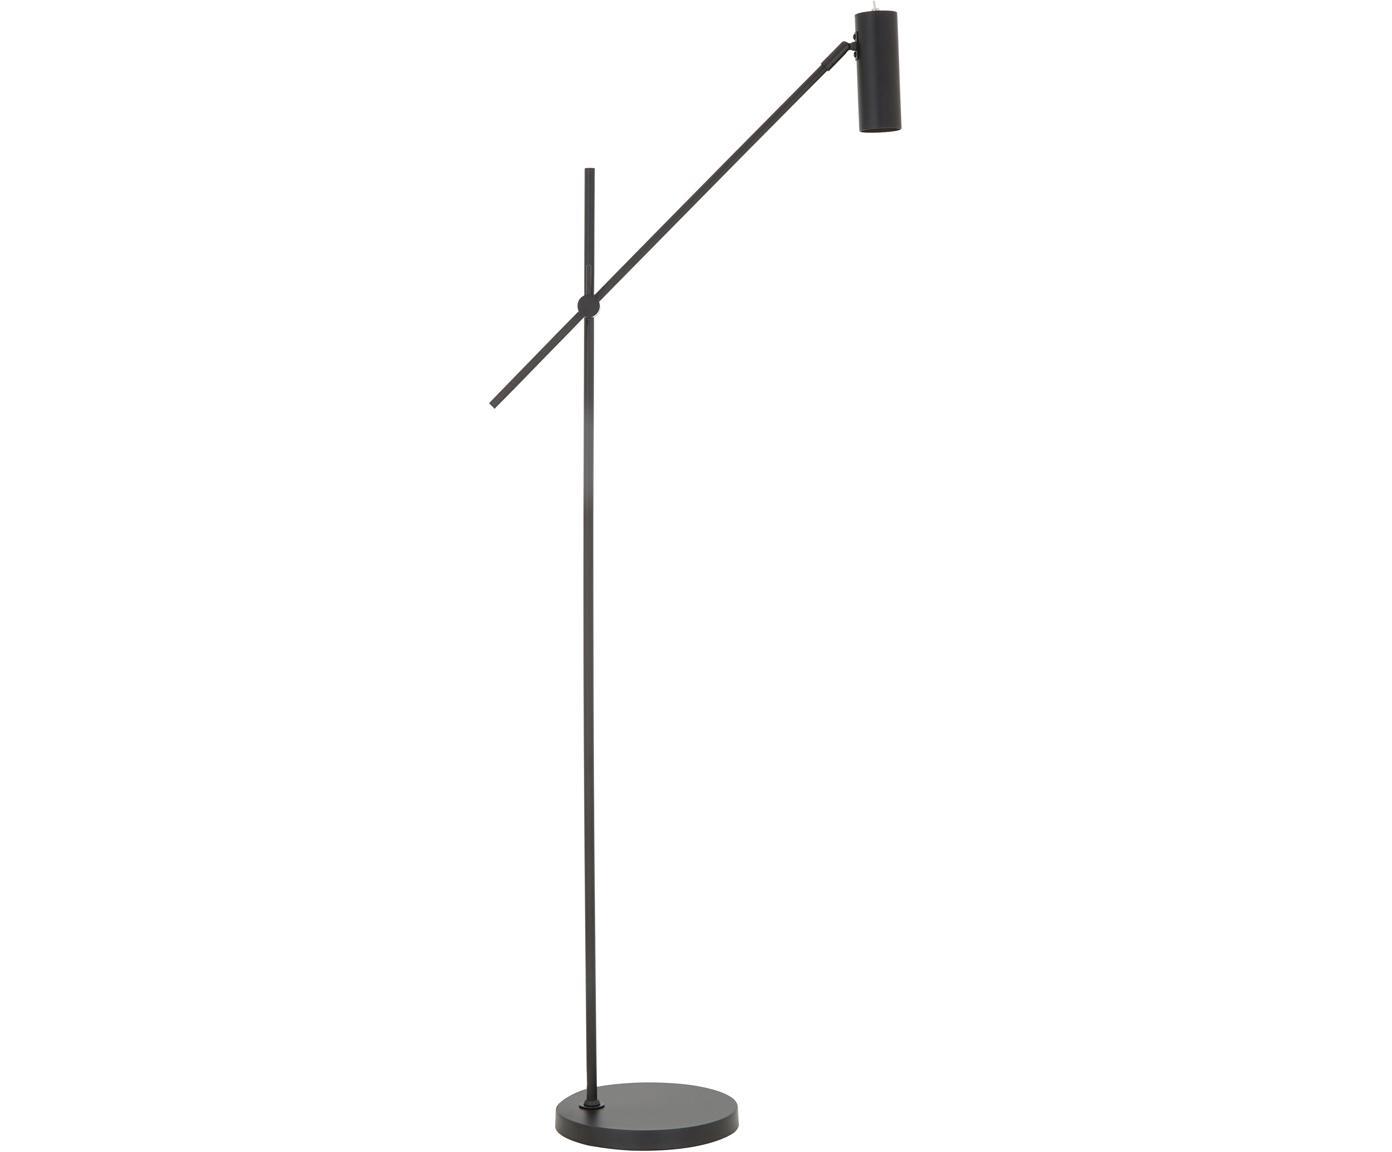 Lámpara de pie Cassandra, Pantalla: metal con pintura en polv, Cable: cubierto en tela, Negro mate, An 75 x Al 152 cm